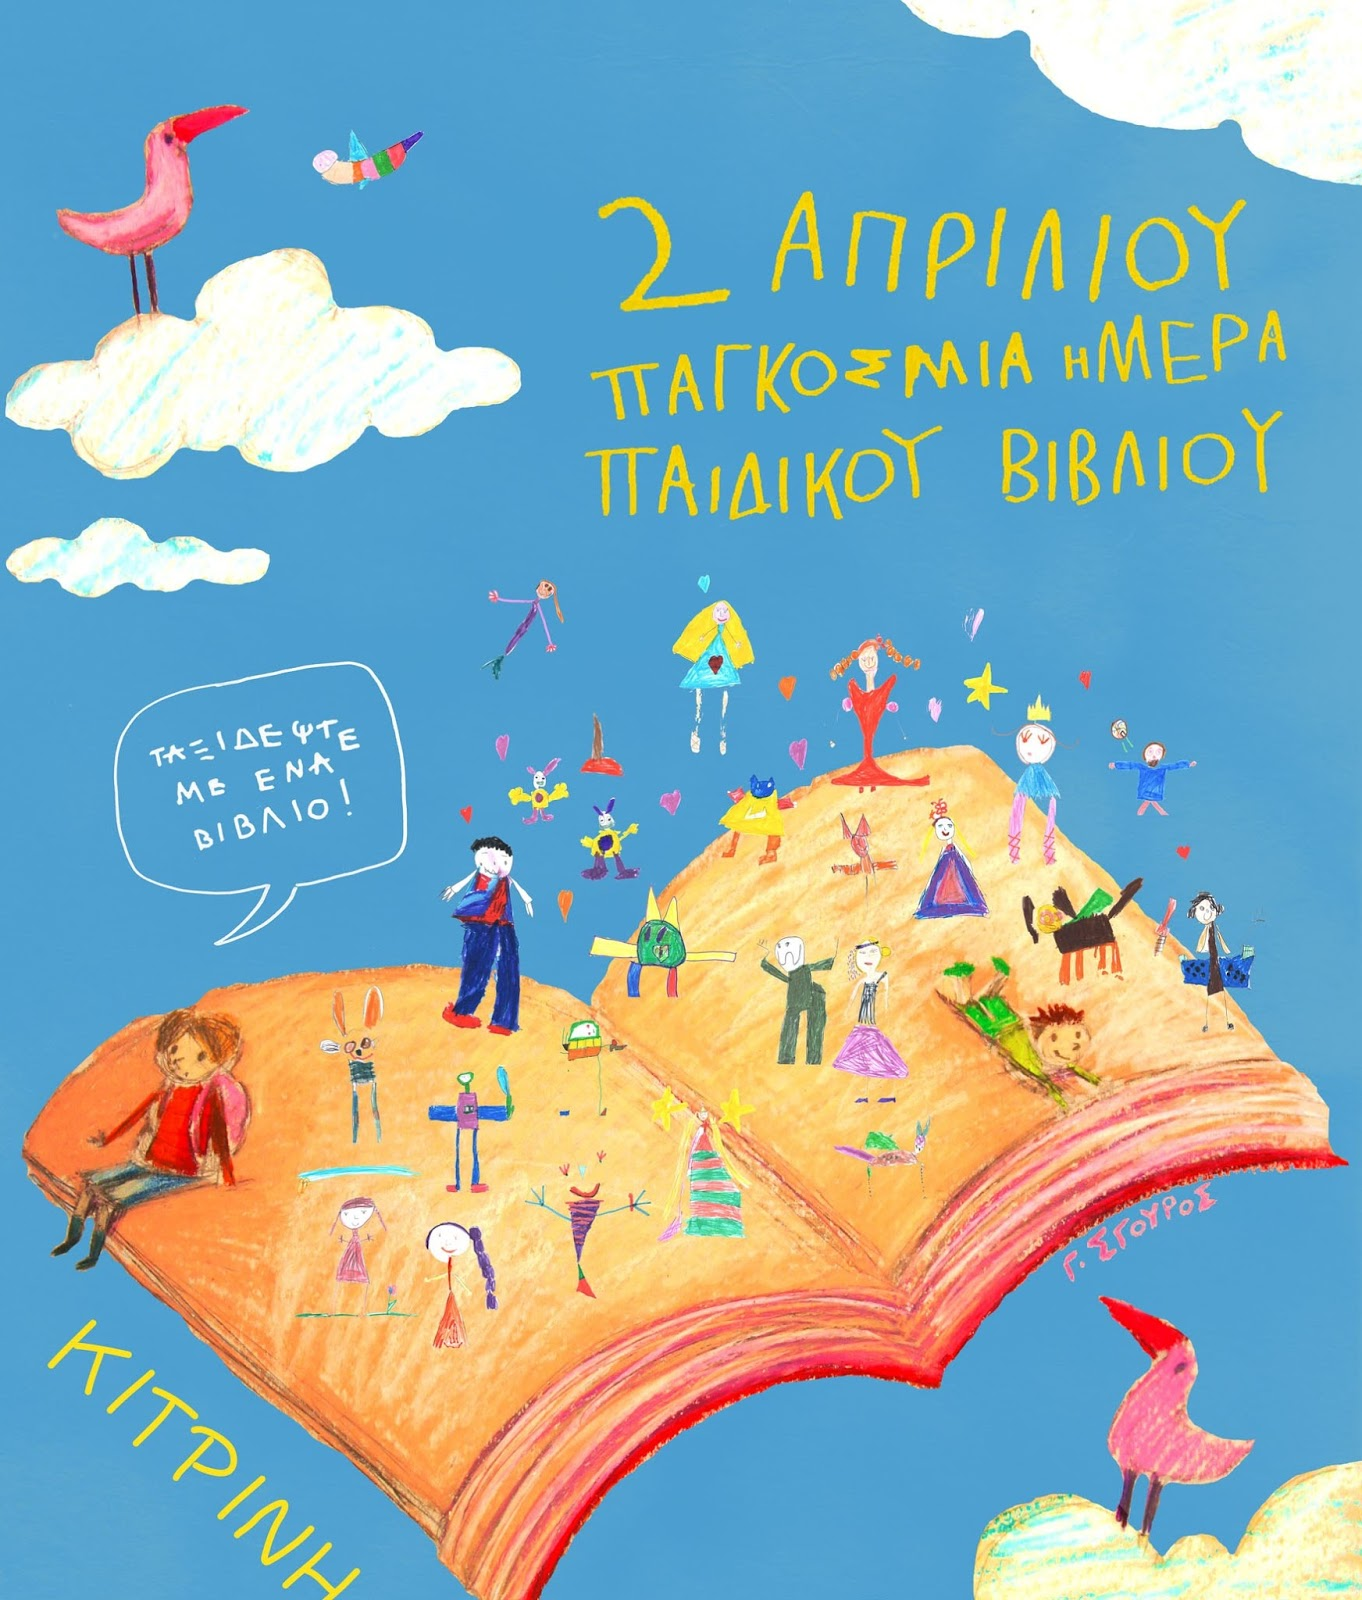 Loveteaching: 2 Απριλίου:Παγκόσμια Ημέρα Παιδικού Βιβλίου